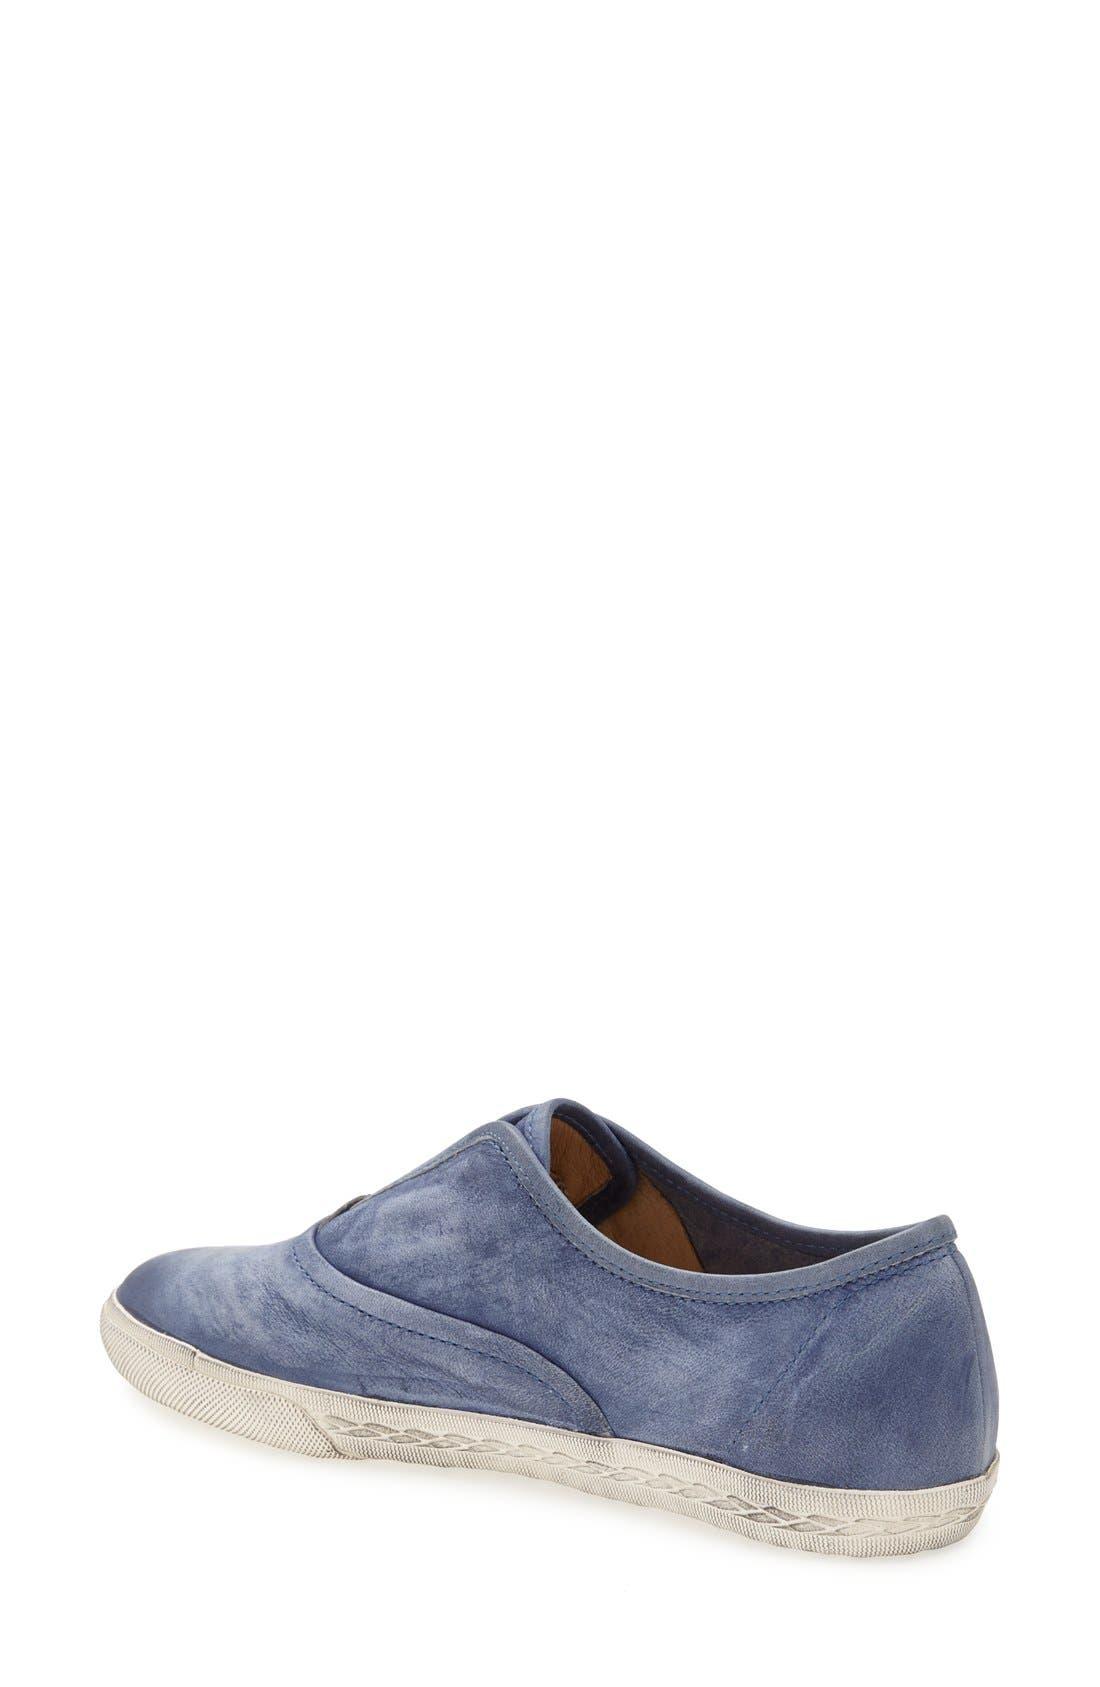 Alternate Image 2  - Frye 'Mindy' Slip-On Leather Sneaker (Women)